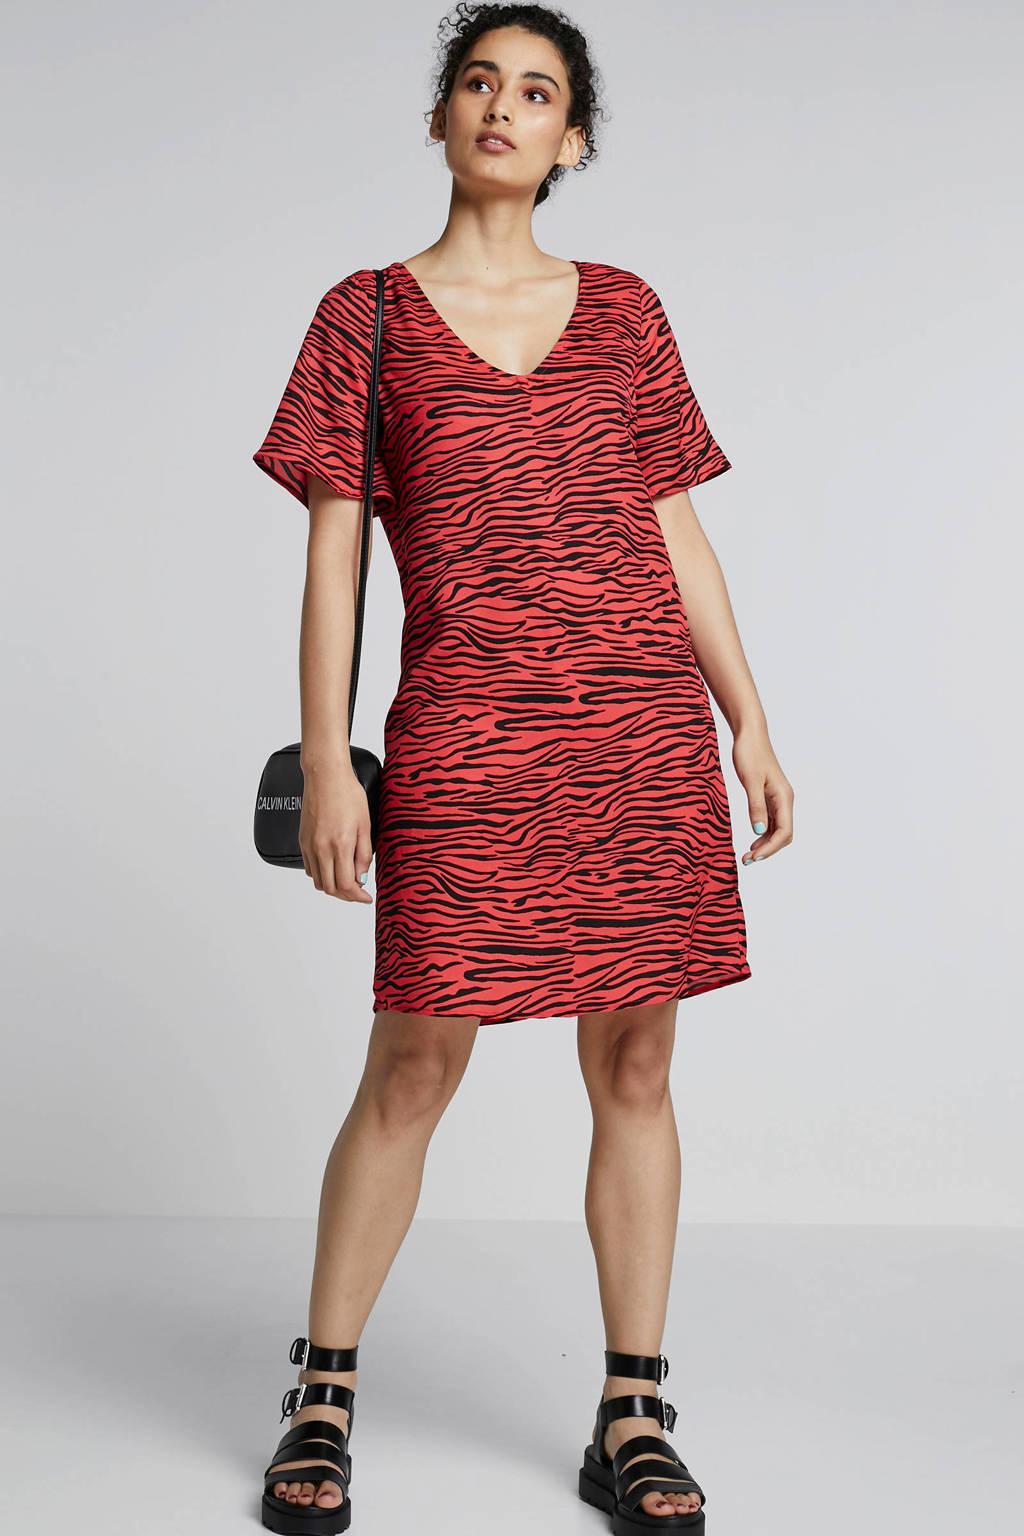 Eksept jurk met zebraprint, Rood/zwart